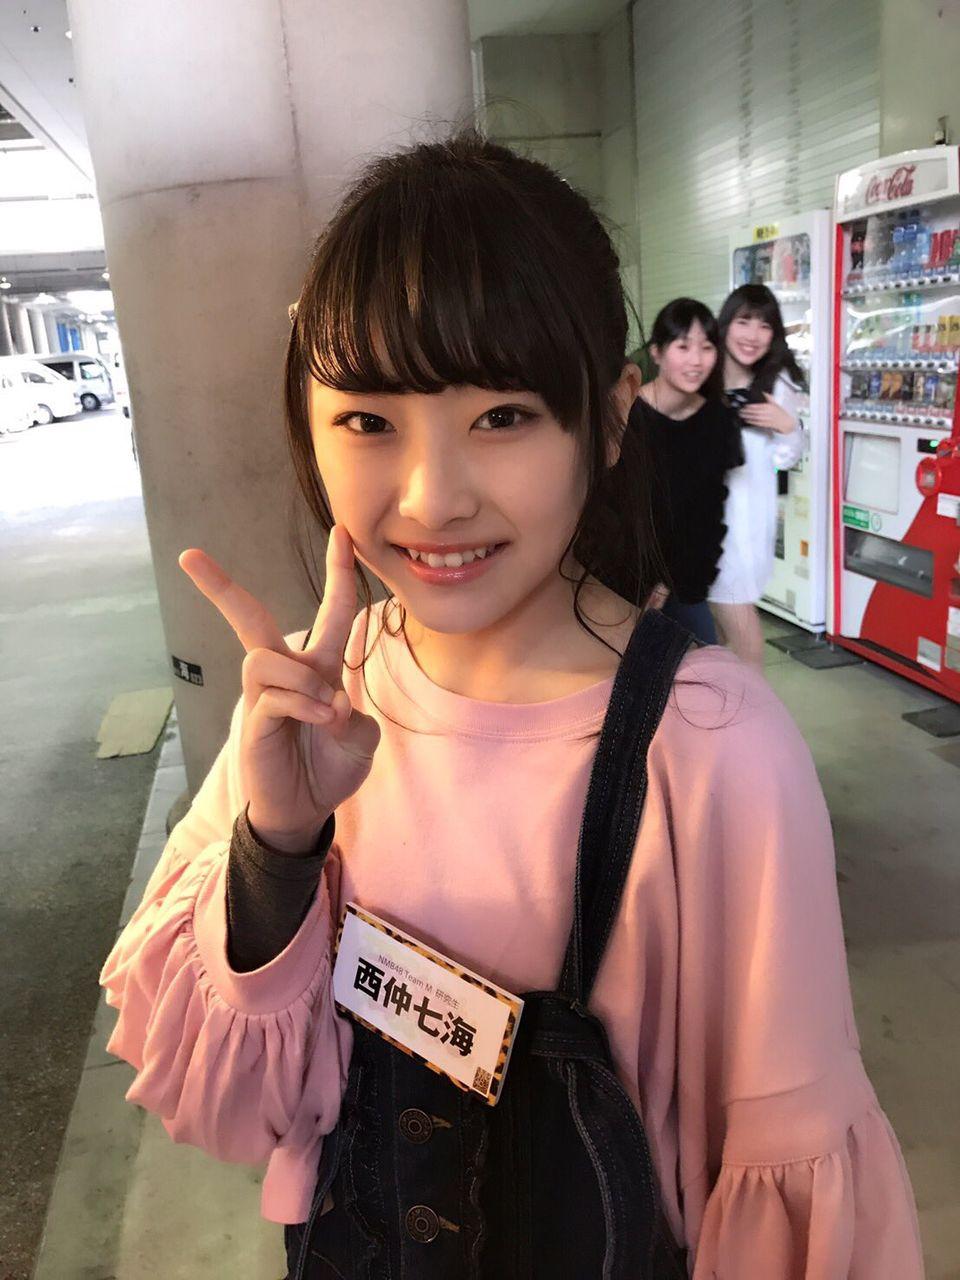 SKE48大矢真那が春祭りで新しい幼女を物色中www @AKB48春祭り